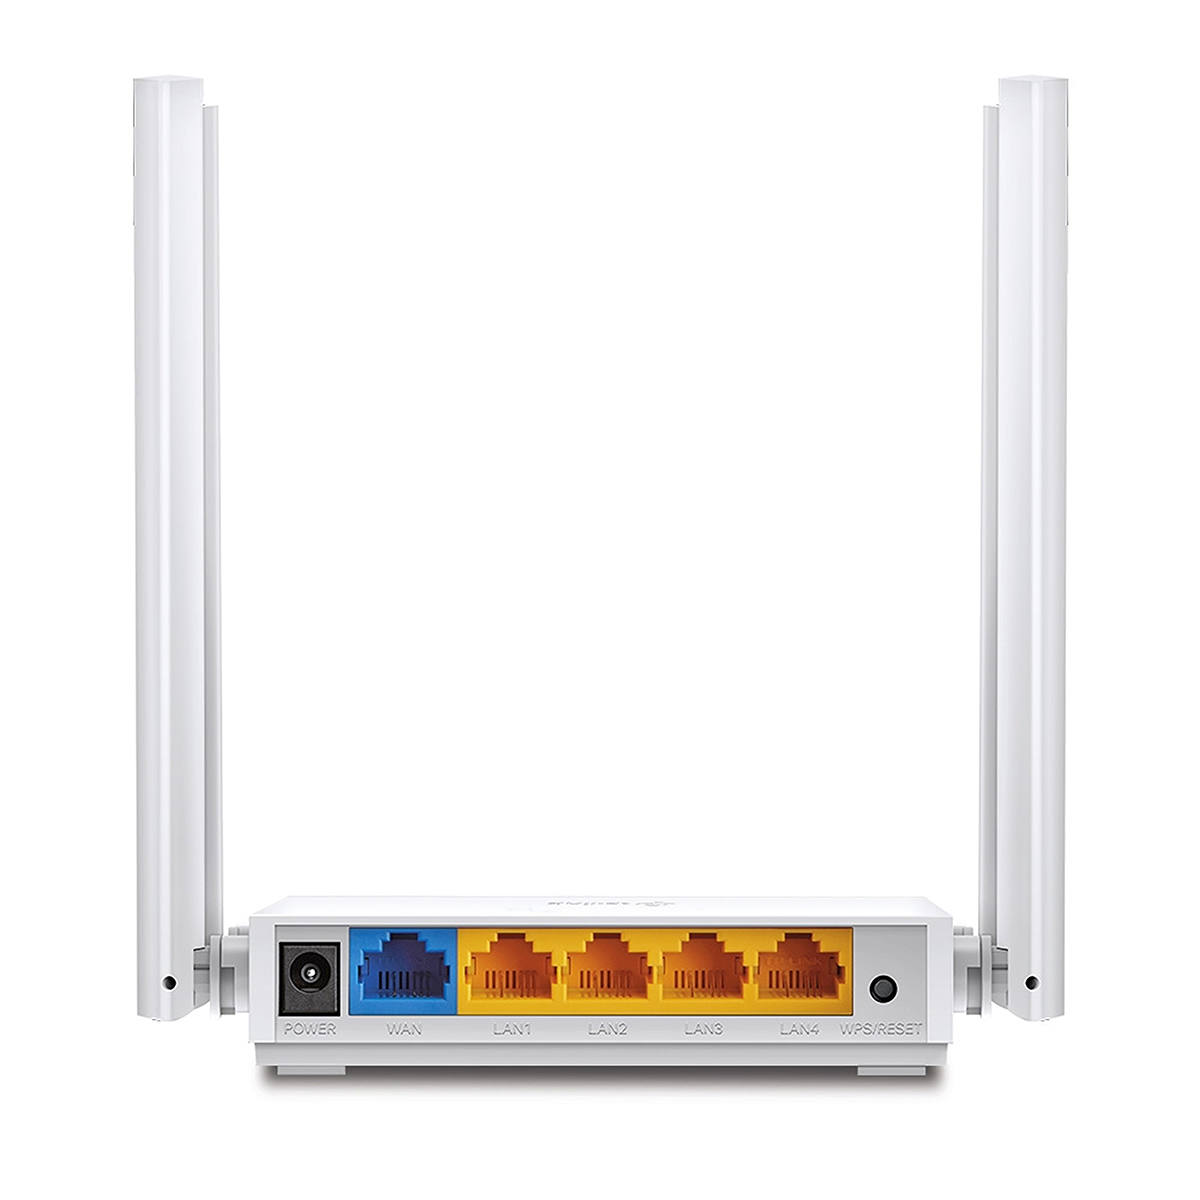 Roteador Wireless AC750 TP-Link Archer C21 Wi-Fi Dual Band 433 Mbps + 300 Mbps 4 Antenas Multi-Modo 3 em 1